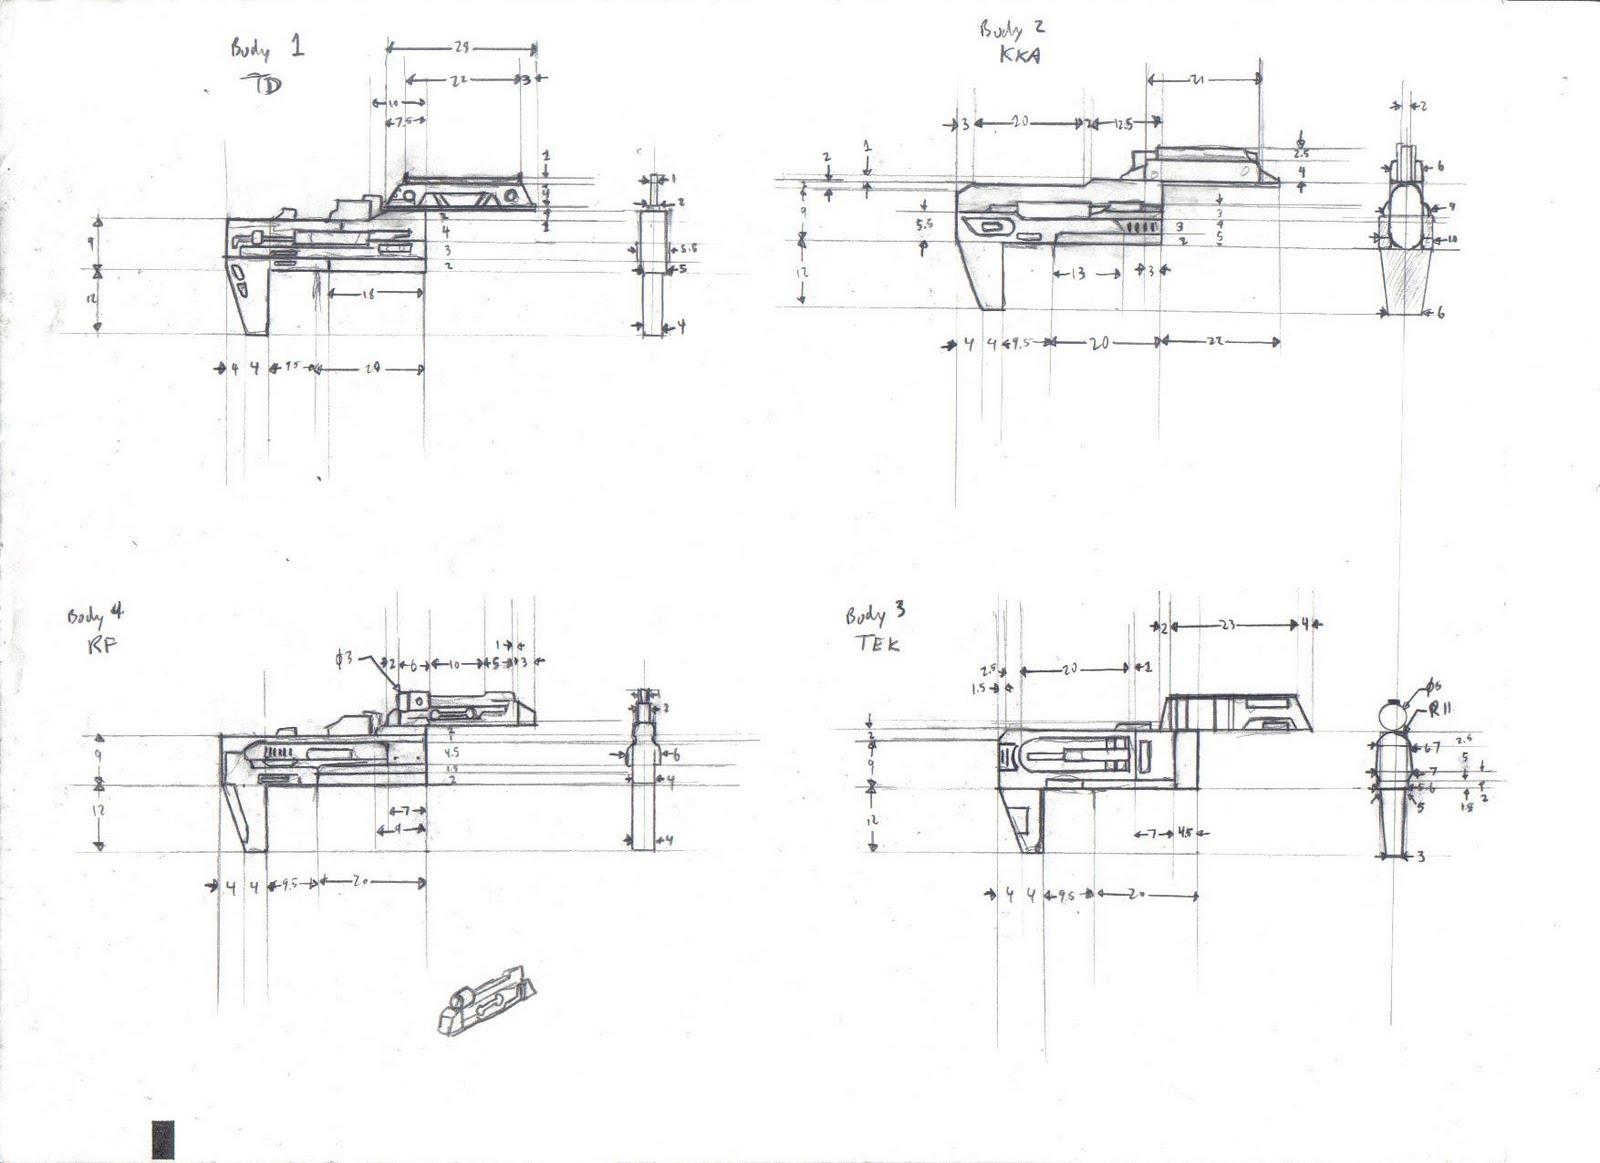 small resolution of fn p90 diagram wiring diagram third level rh p 90 wirig diagram grease gun diagram glock